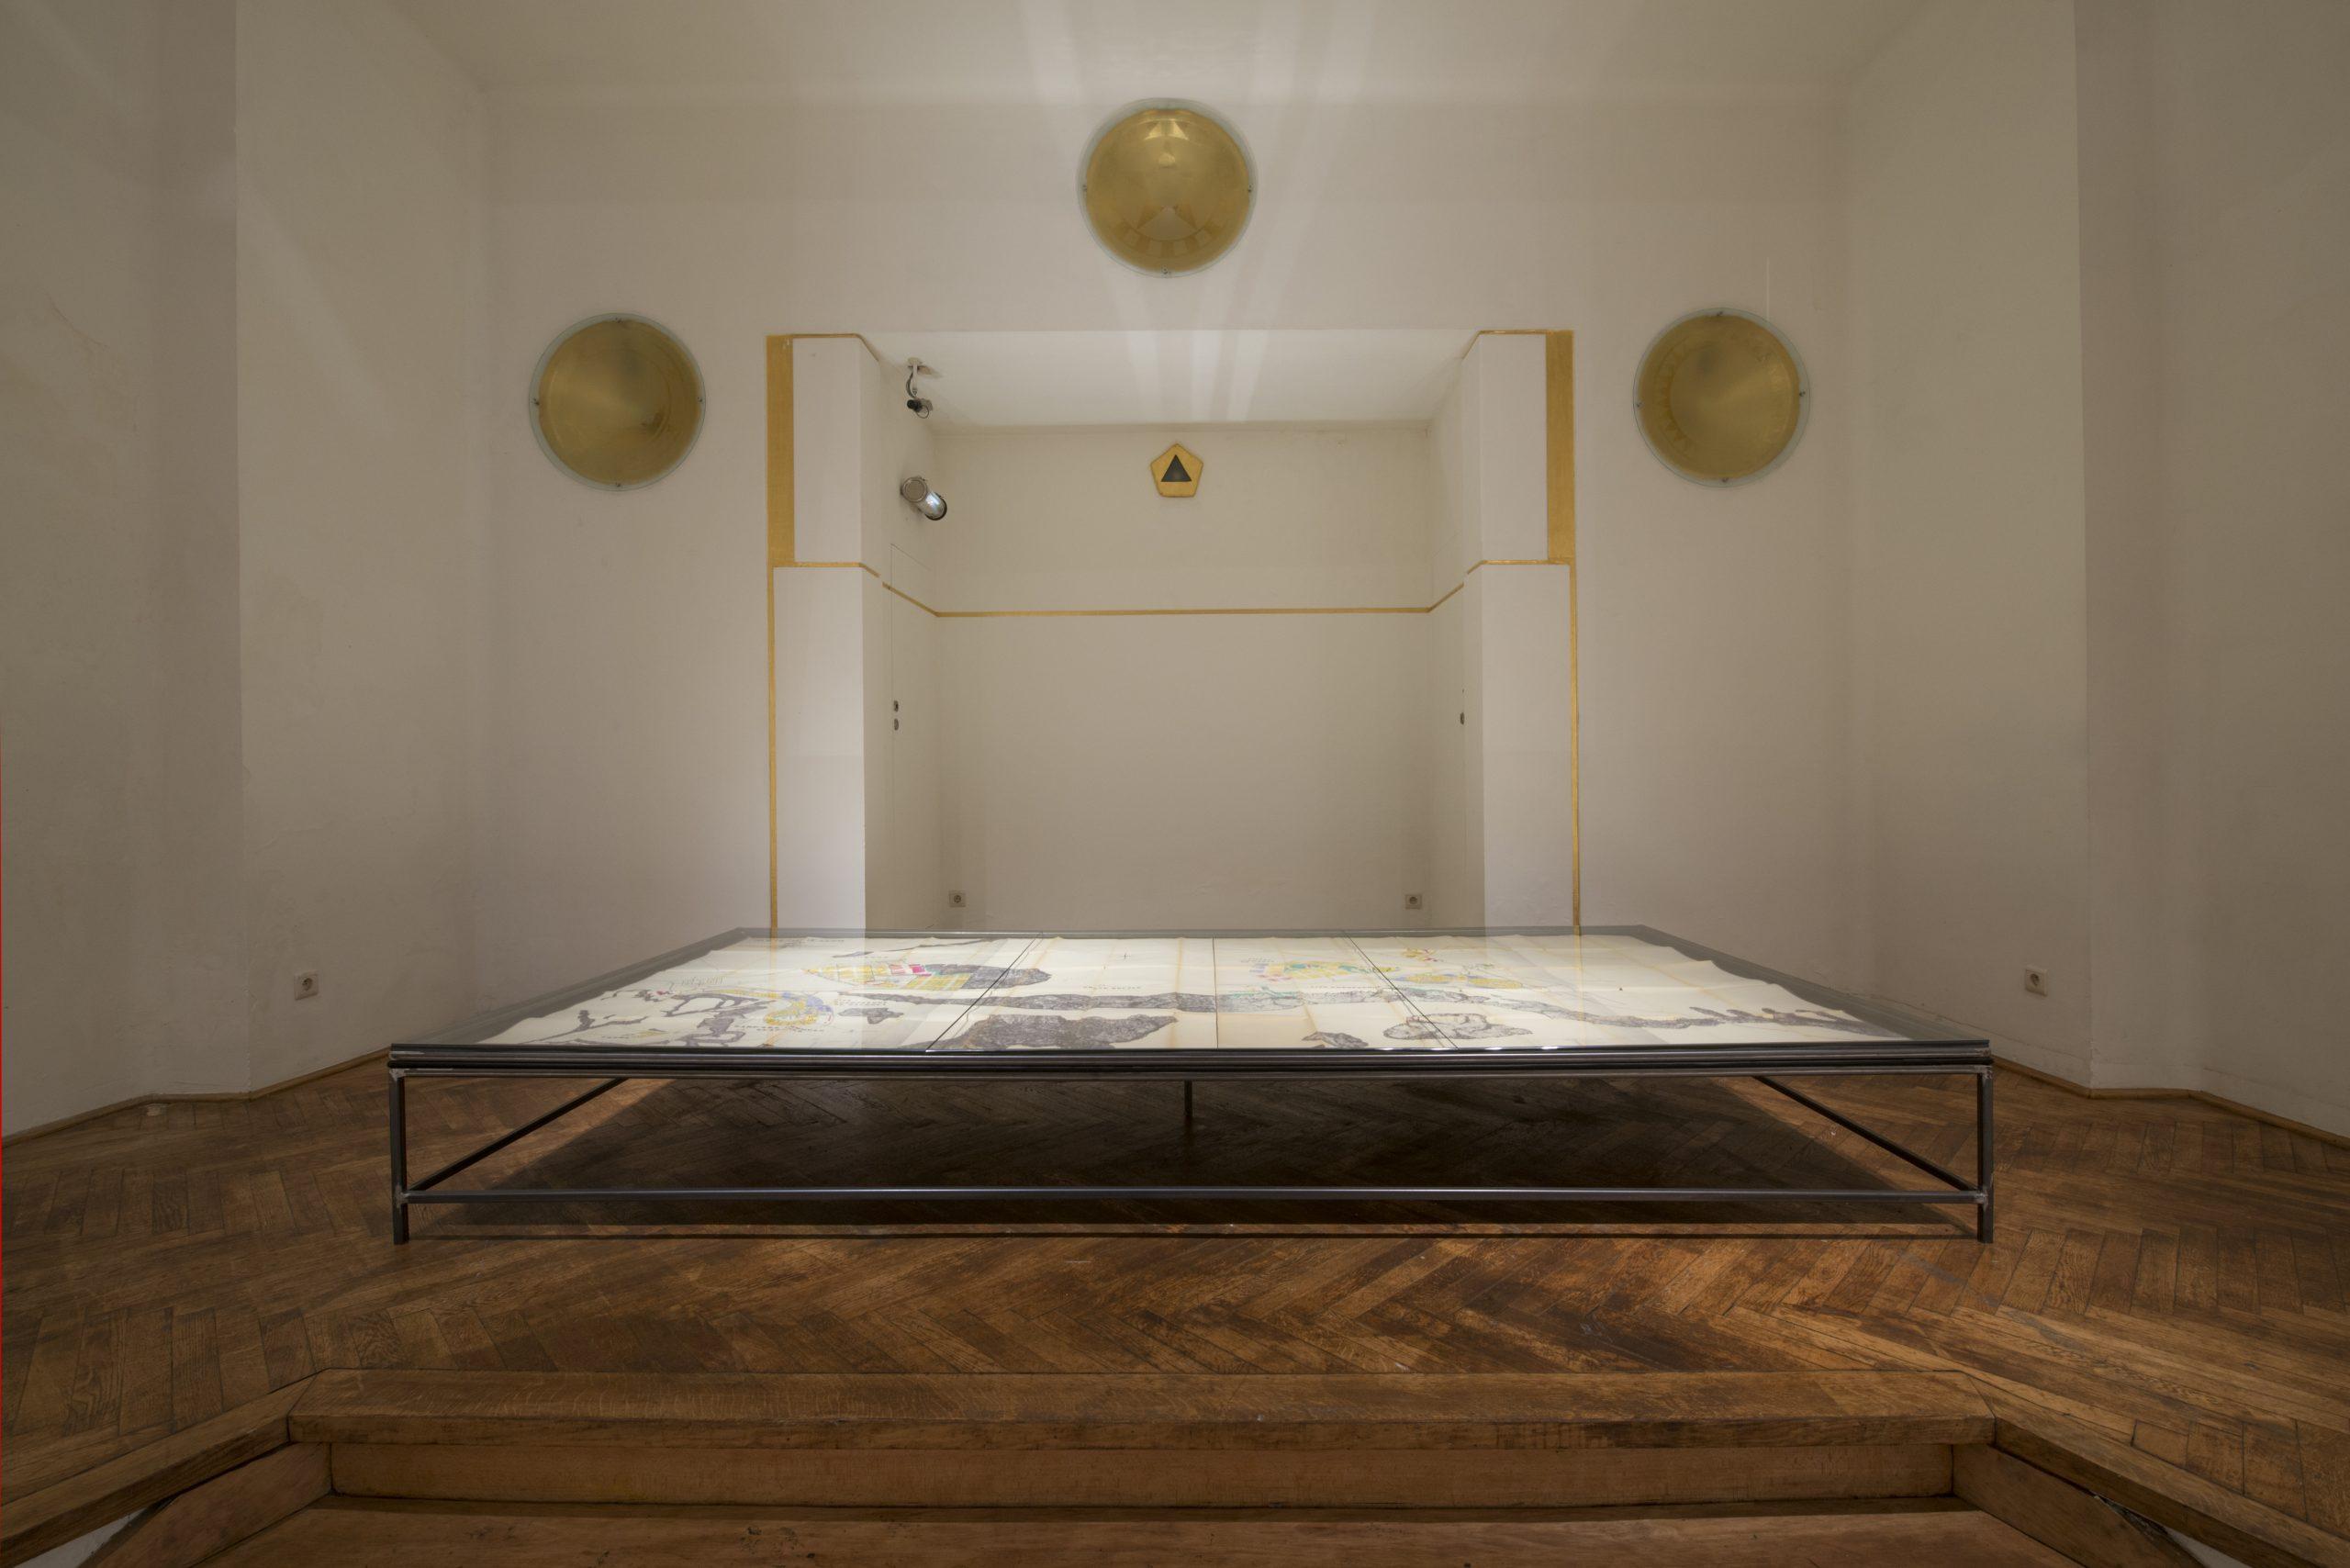 Sven Augustijnen, installation view at La Loge, 2016